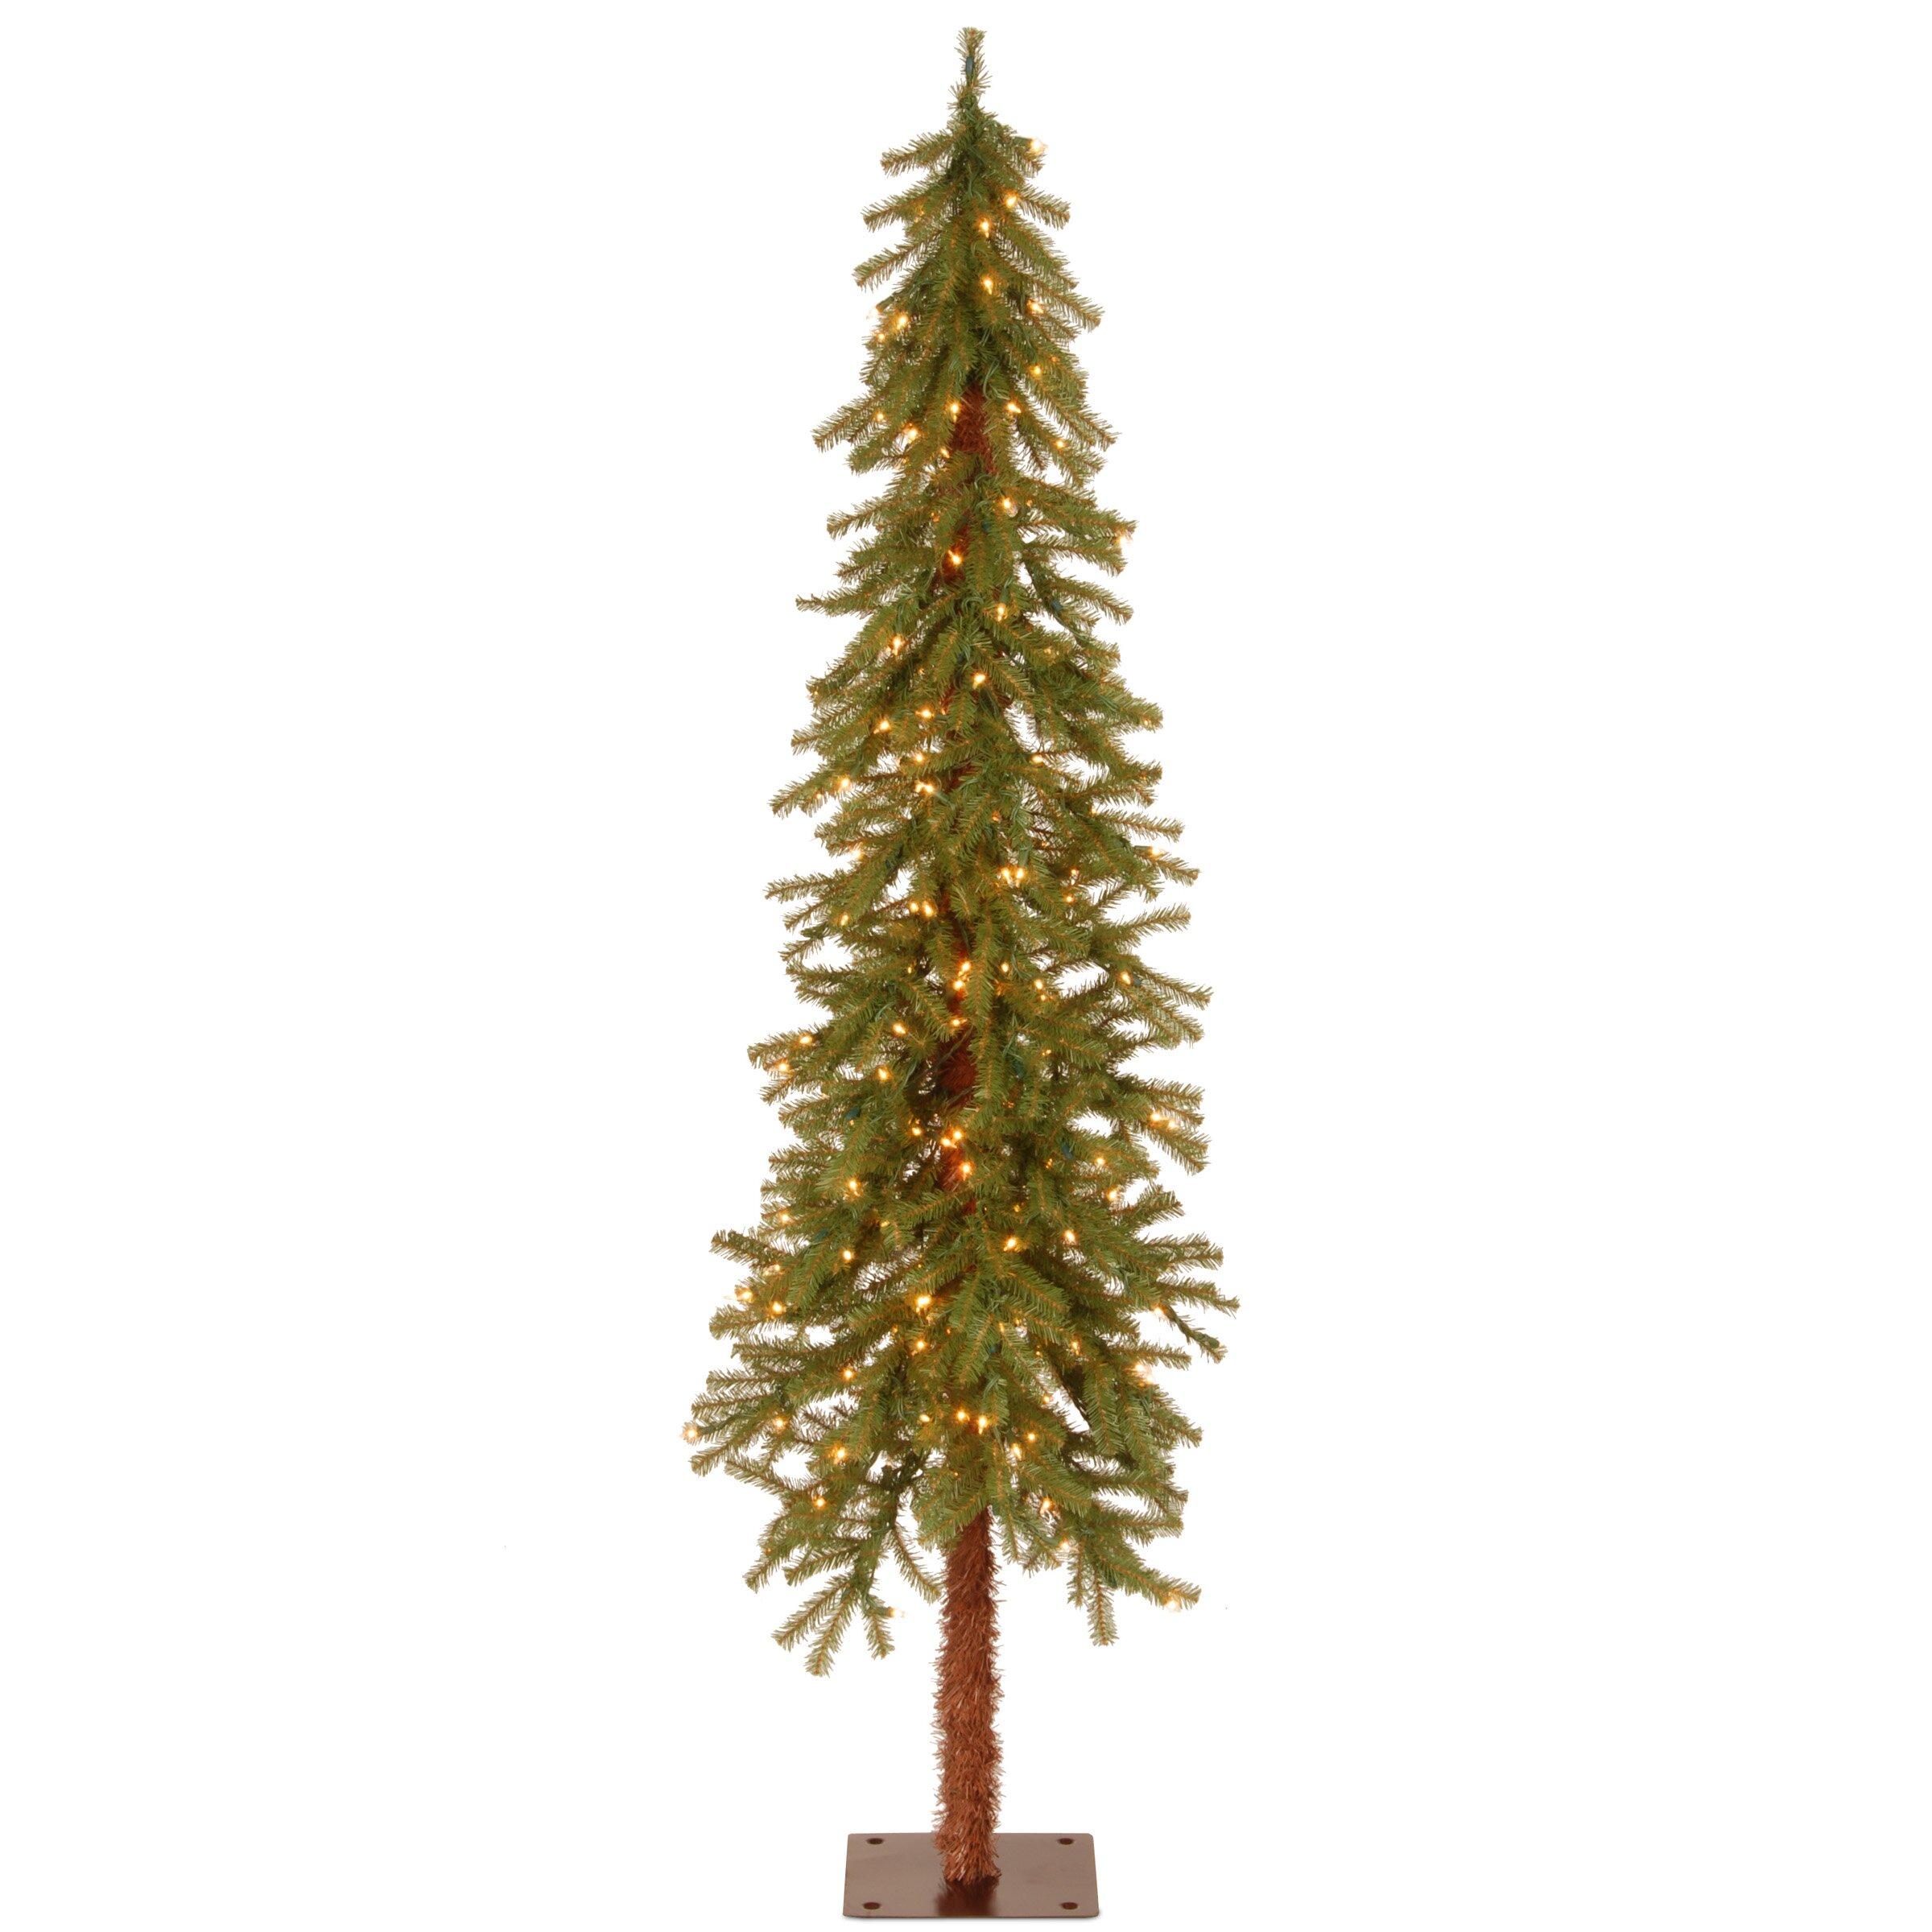 National Tree Co. Hickory Cedar 6' Green Artificial